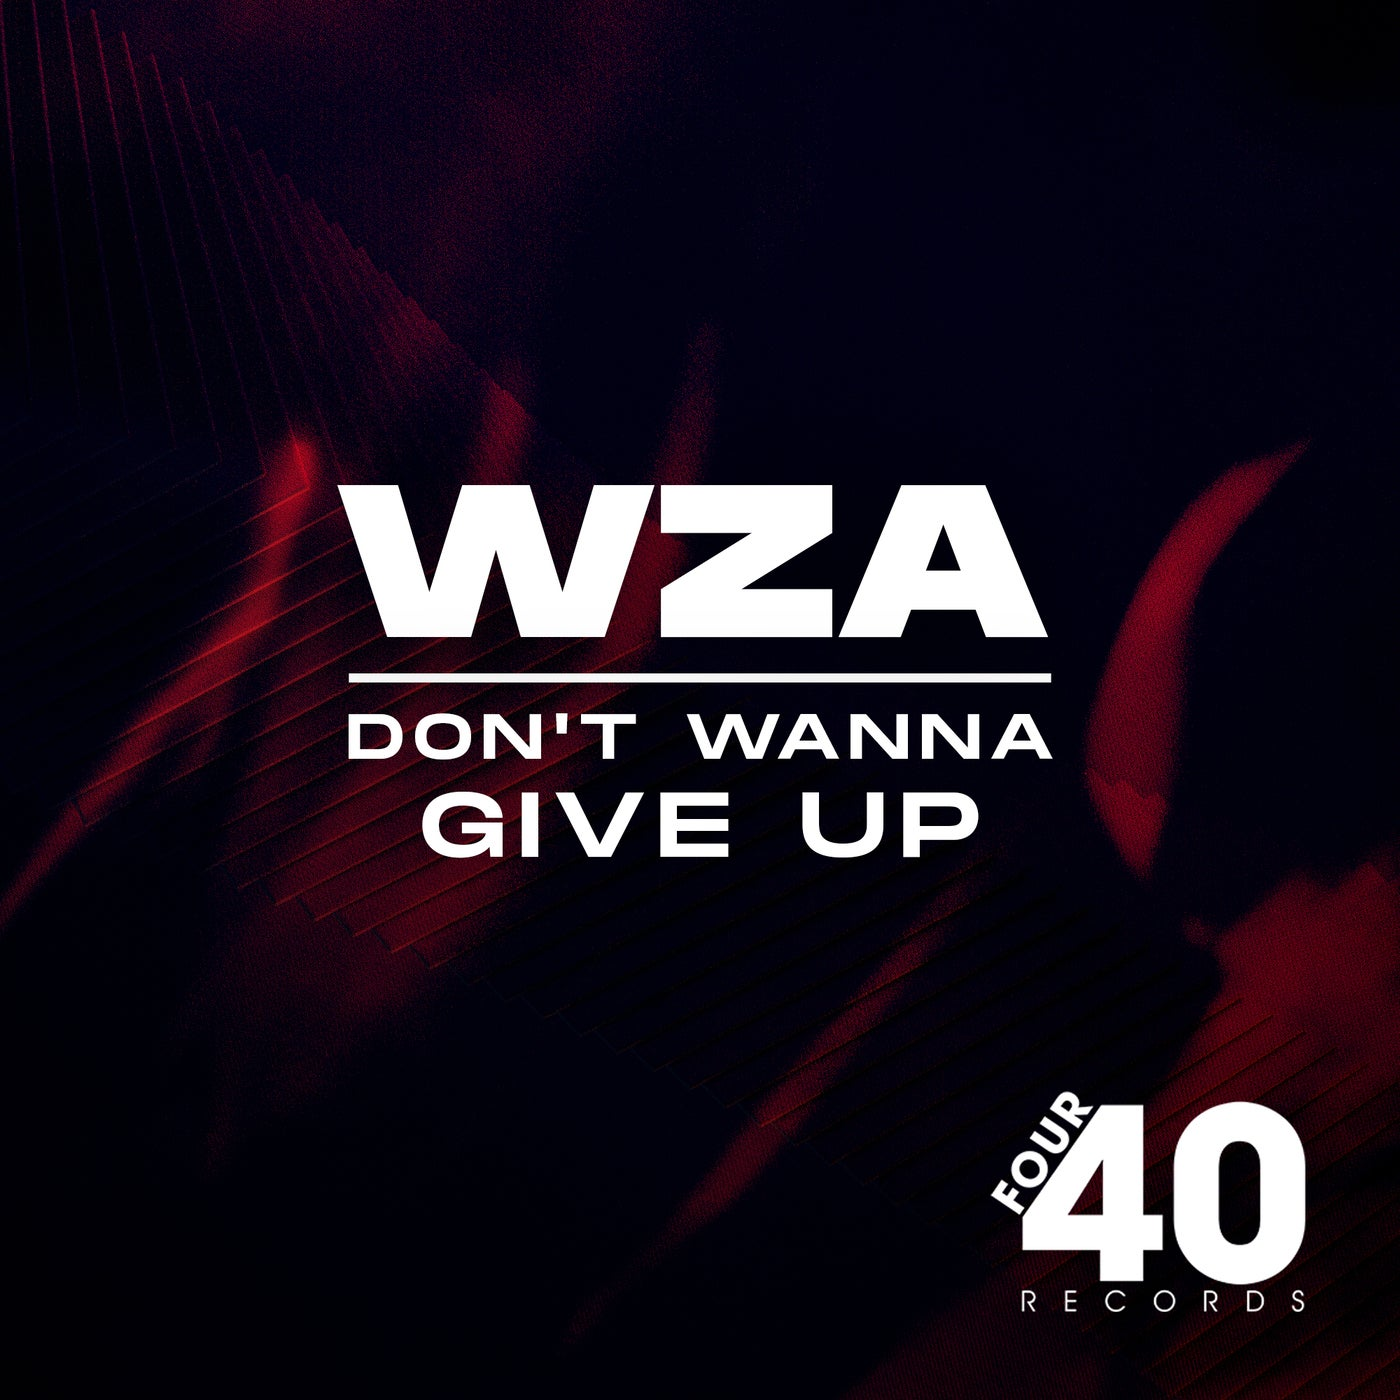 Don't Wanna Give Up (Original Mix)